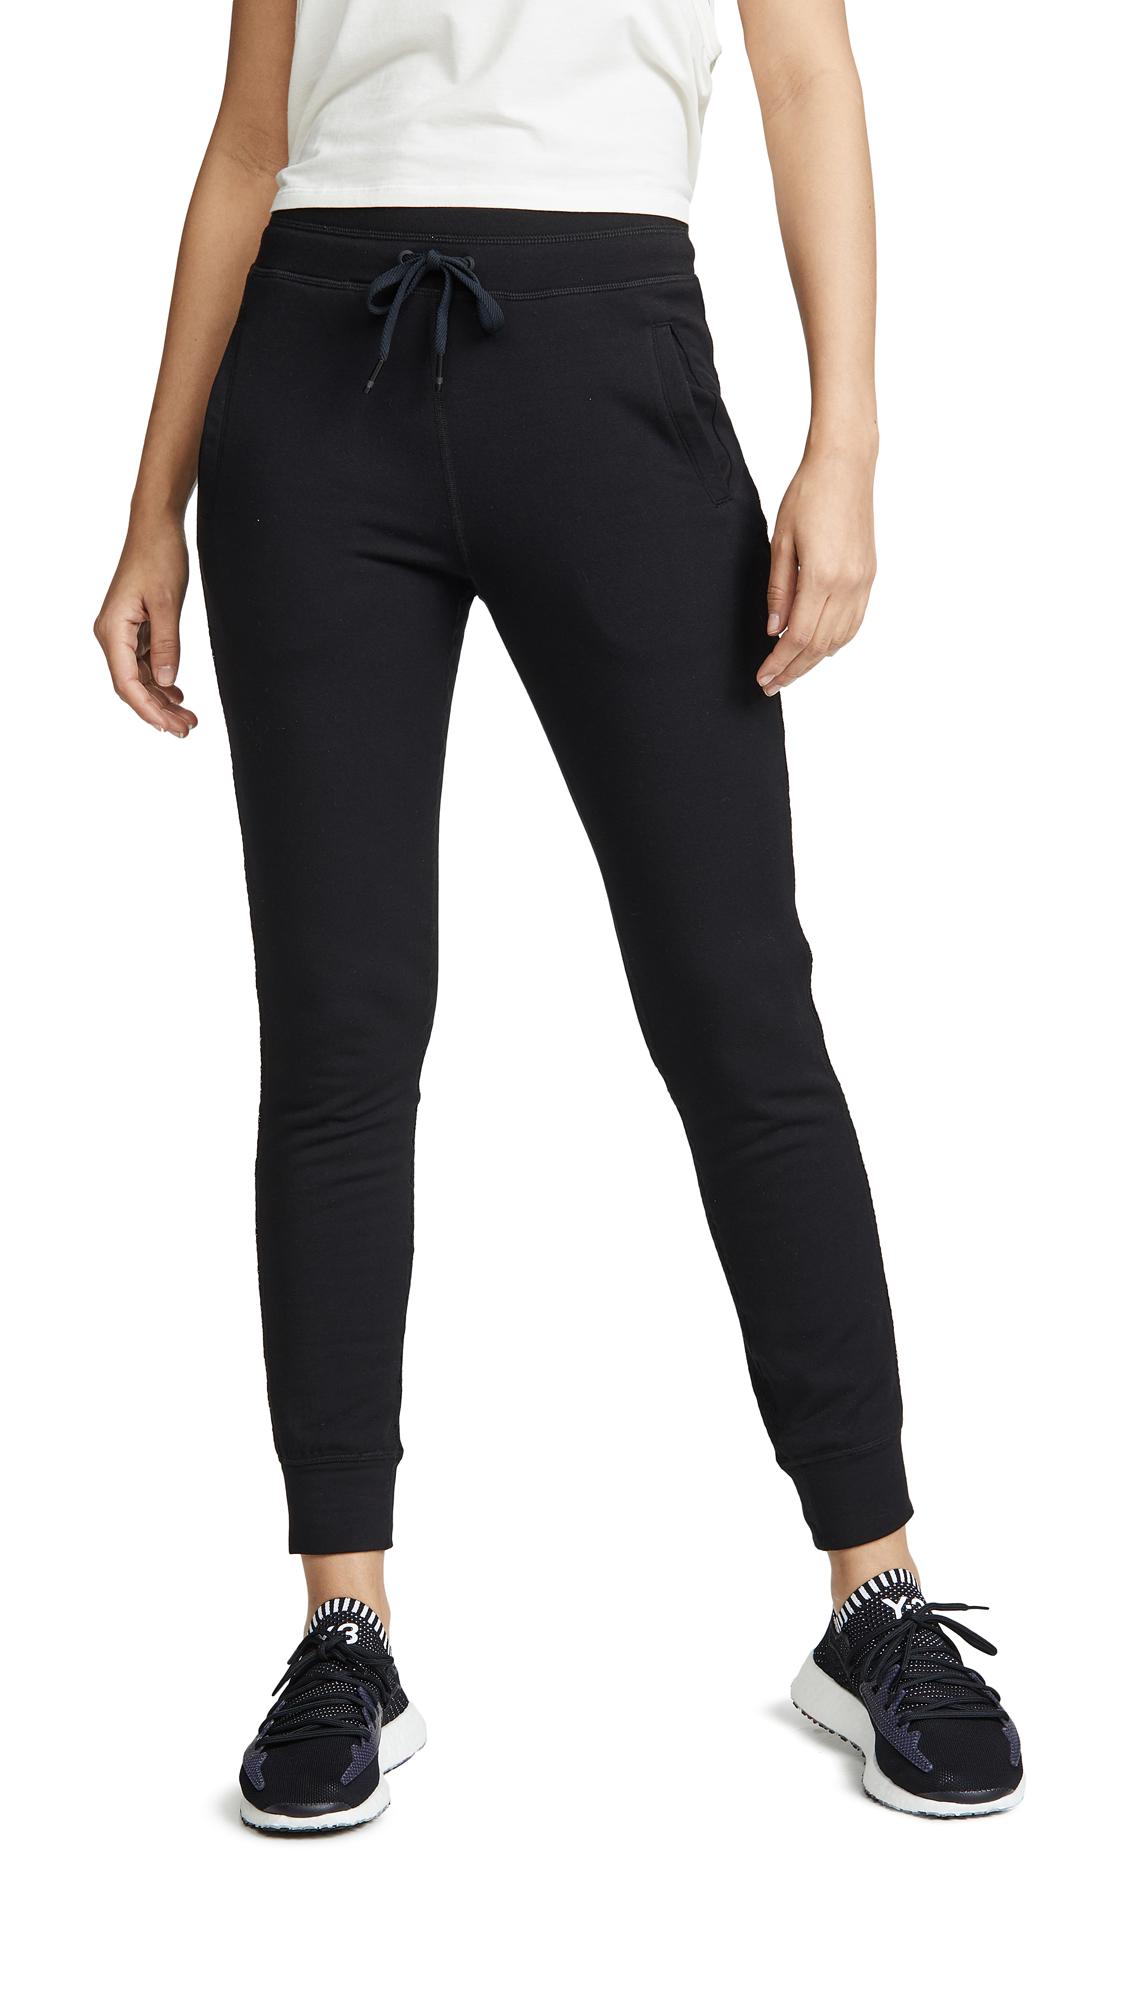 Crane Sweatpants in Black